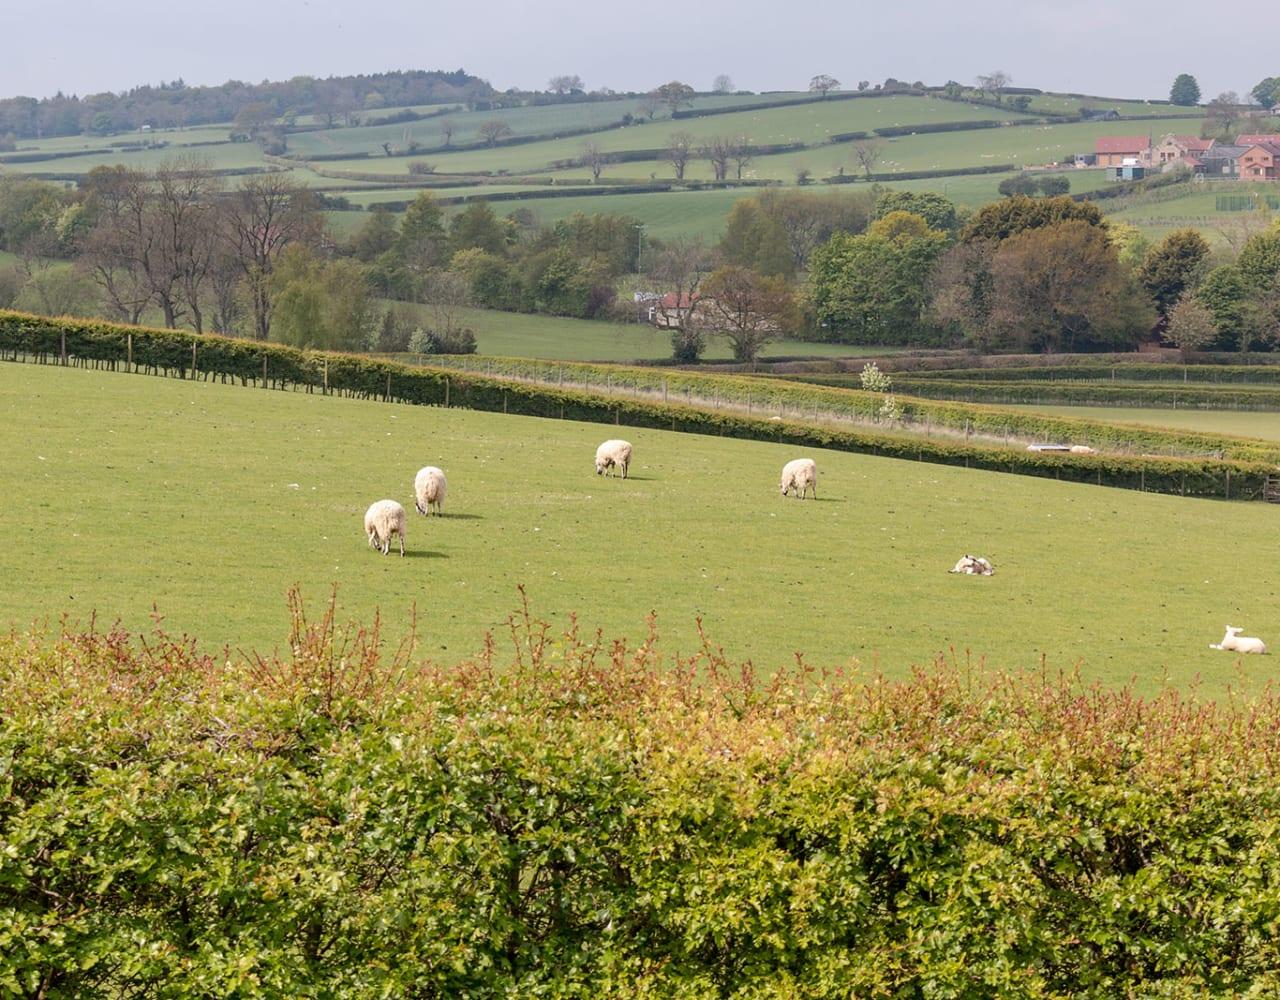 Grazing sheep in field